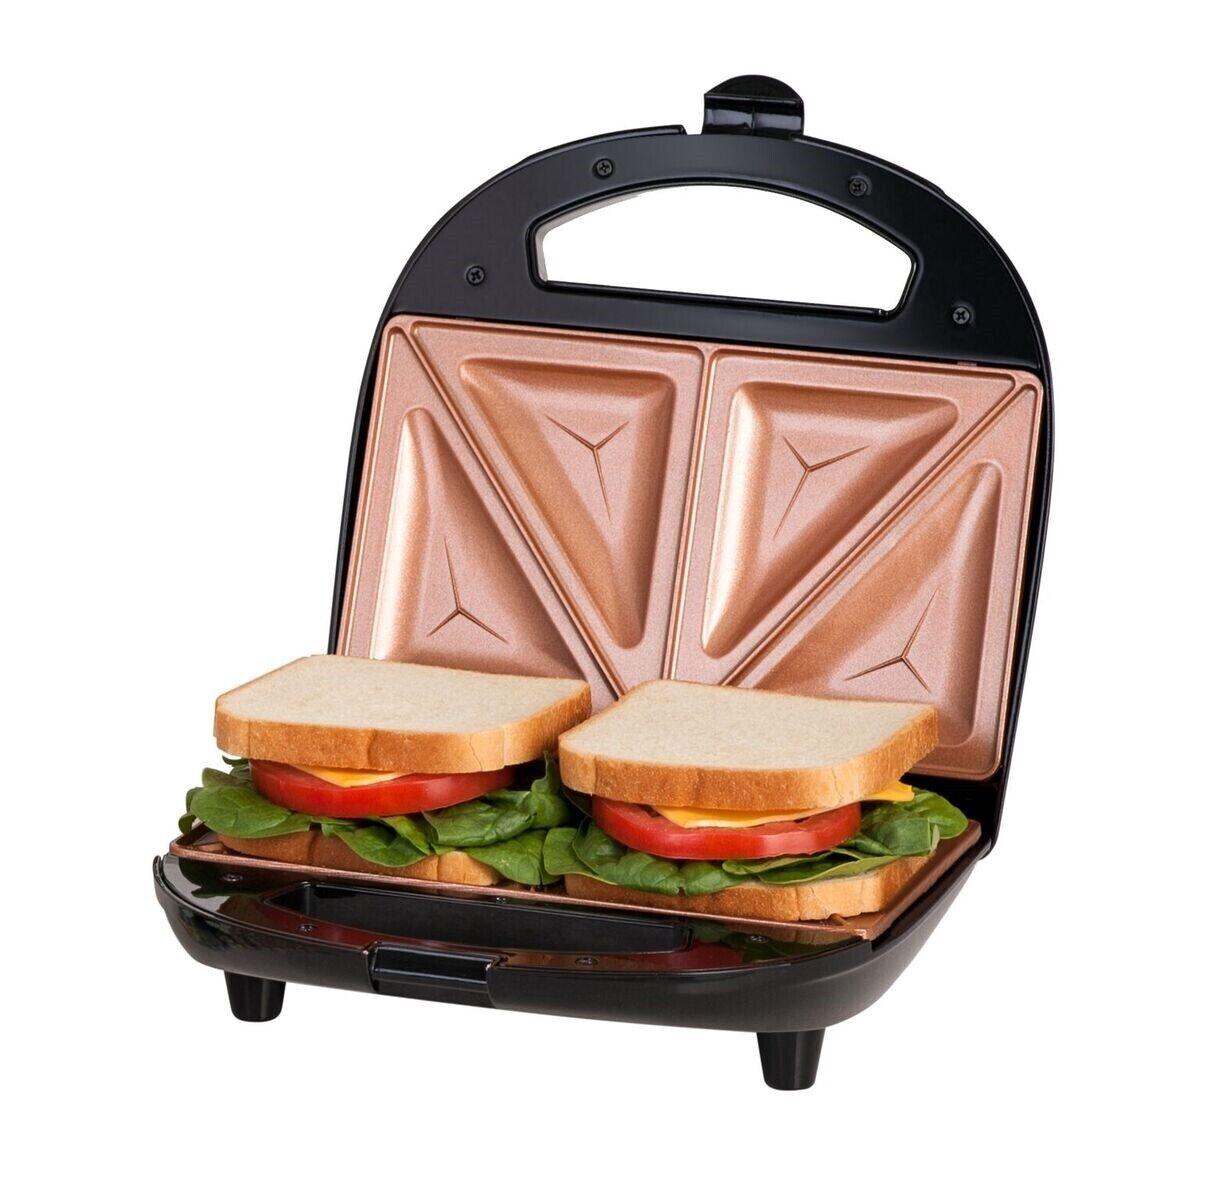 Gotham Steel Nonstick Portable Sandwich Maker & Panini Grill